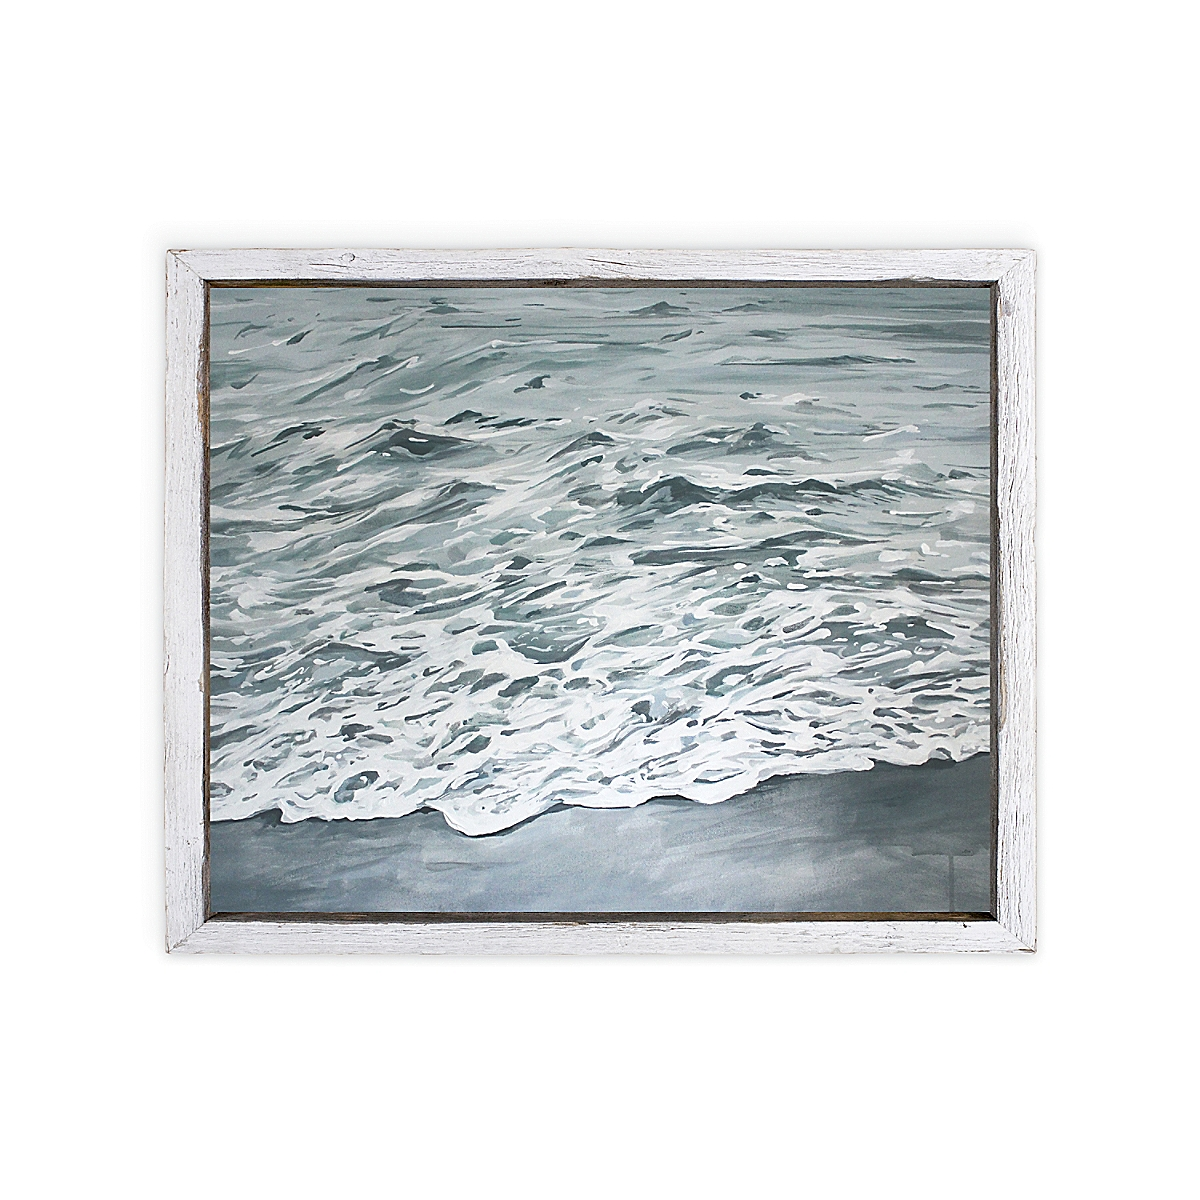 The Peaceful Tide